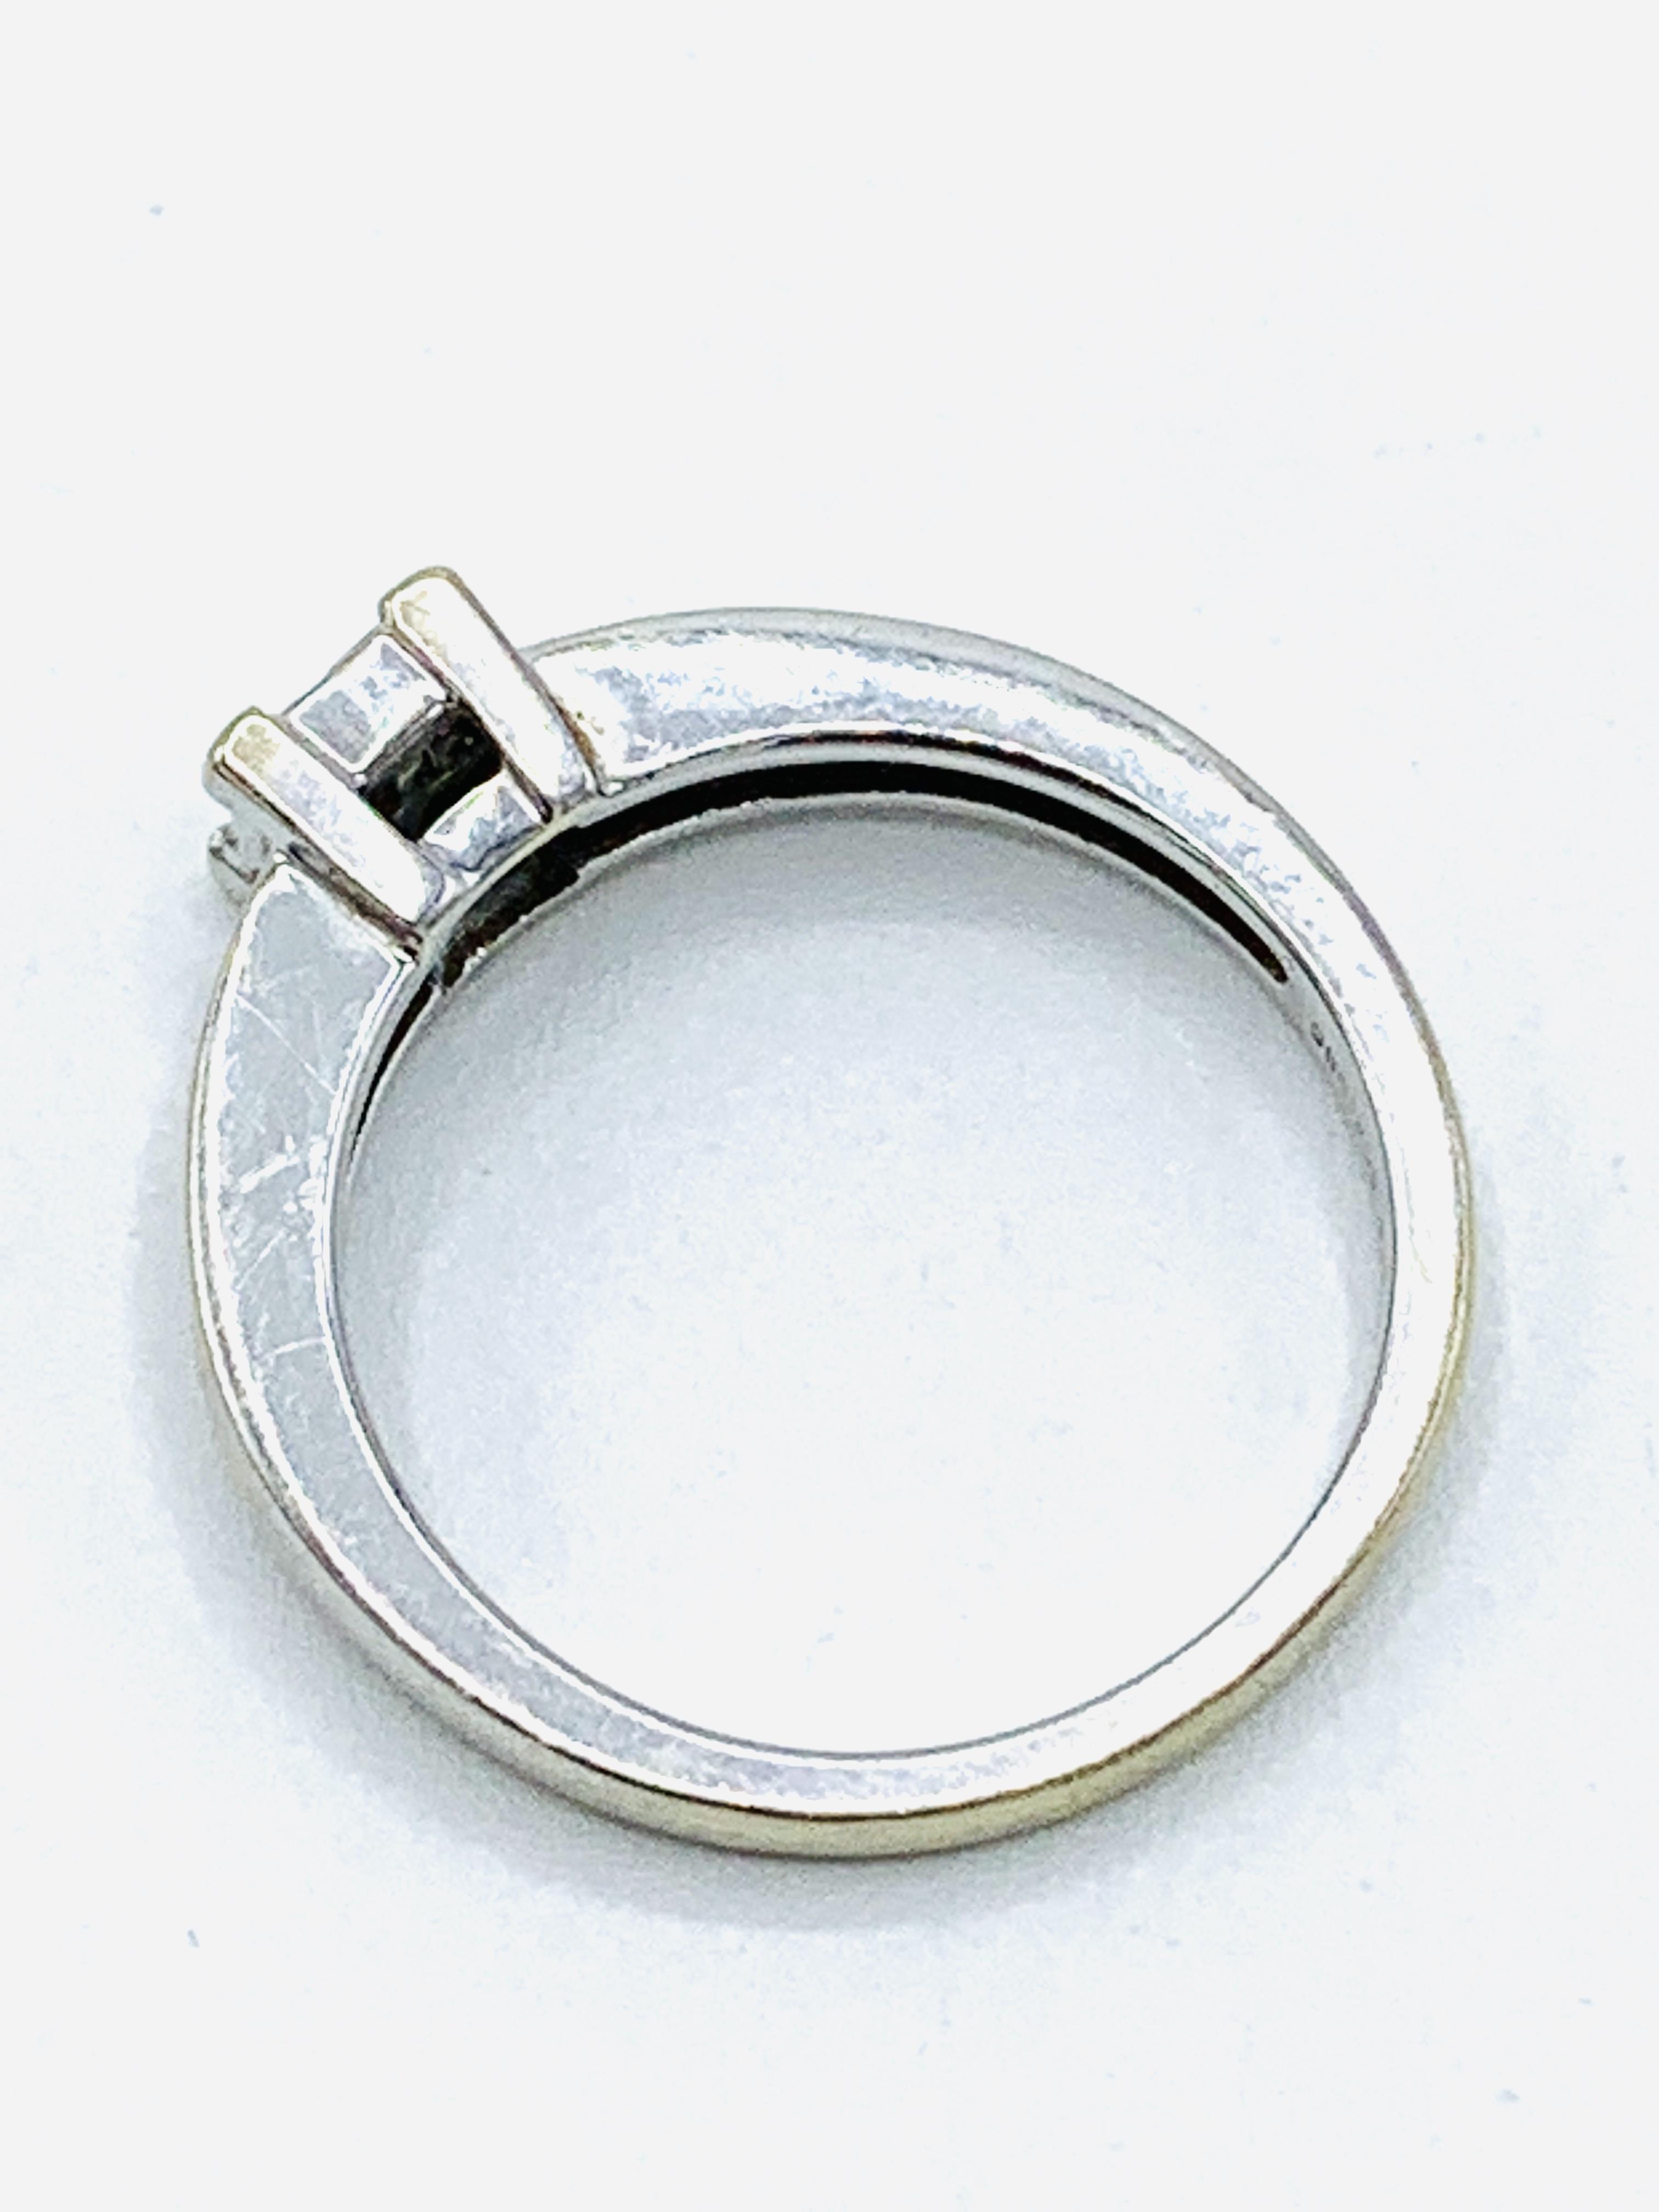 18ct white gold ring - Image 3 of 4